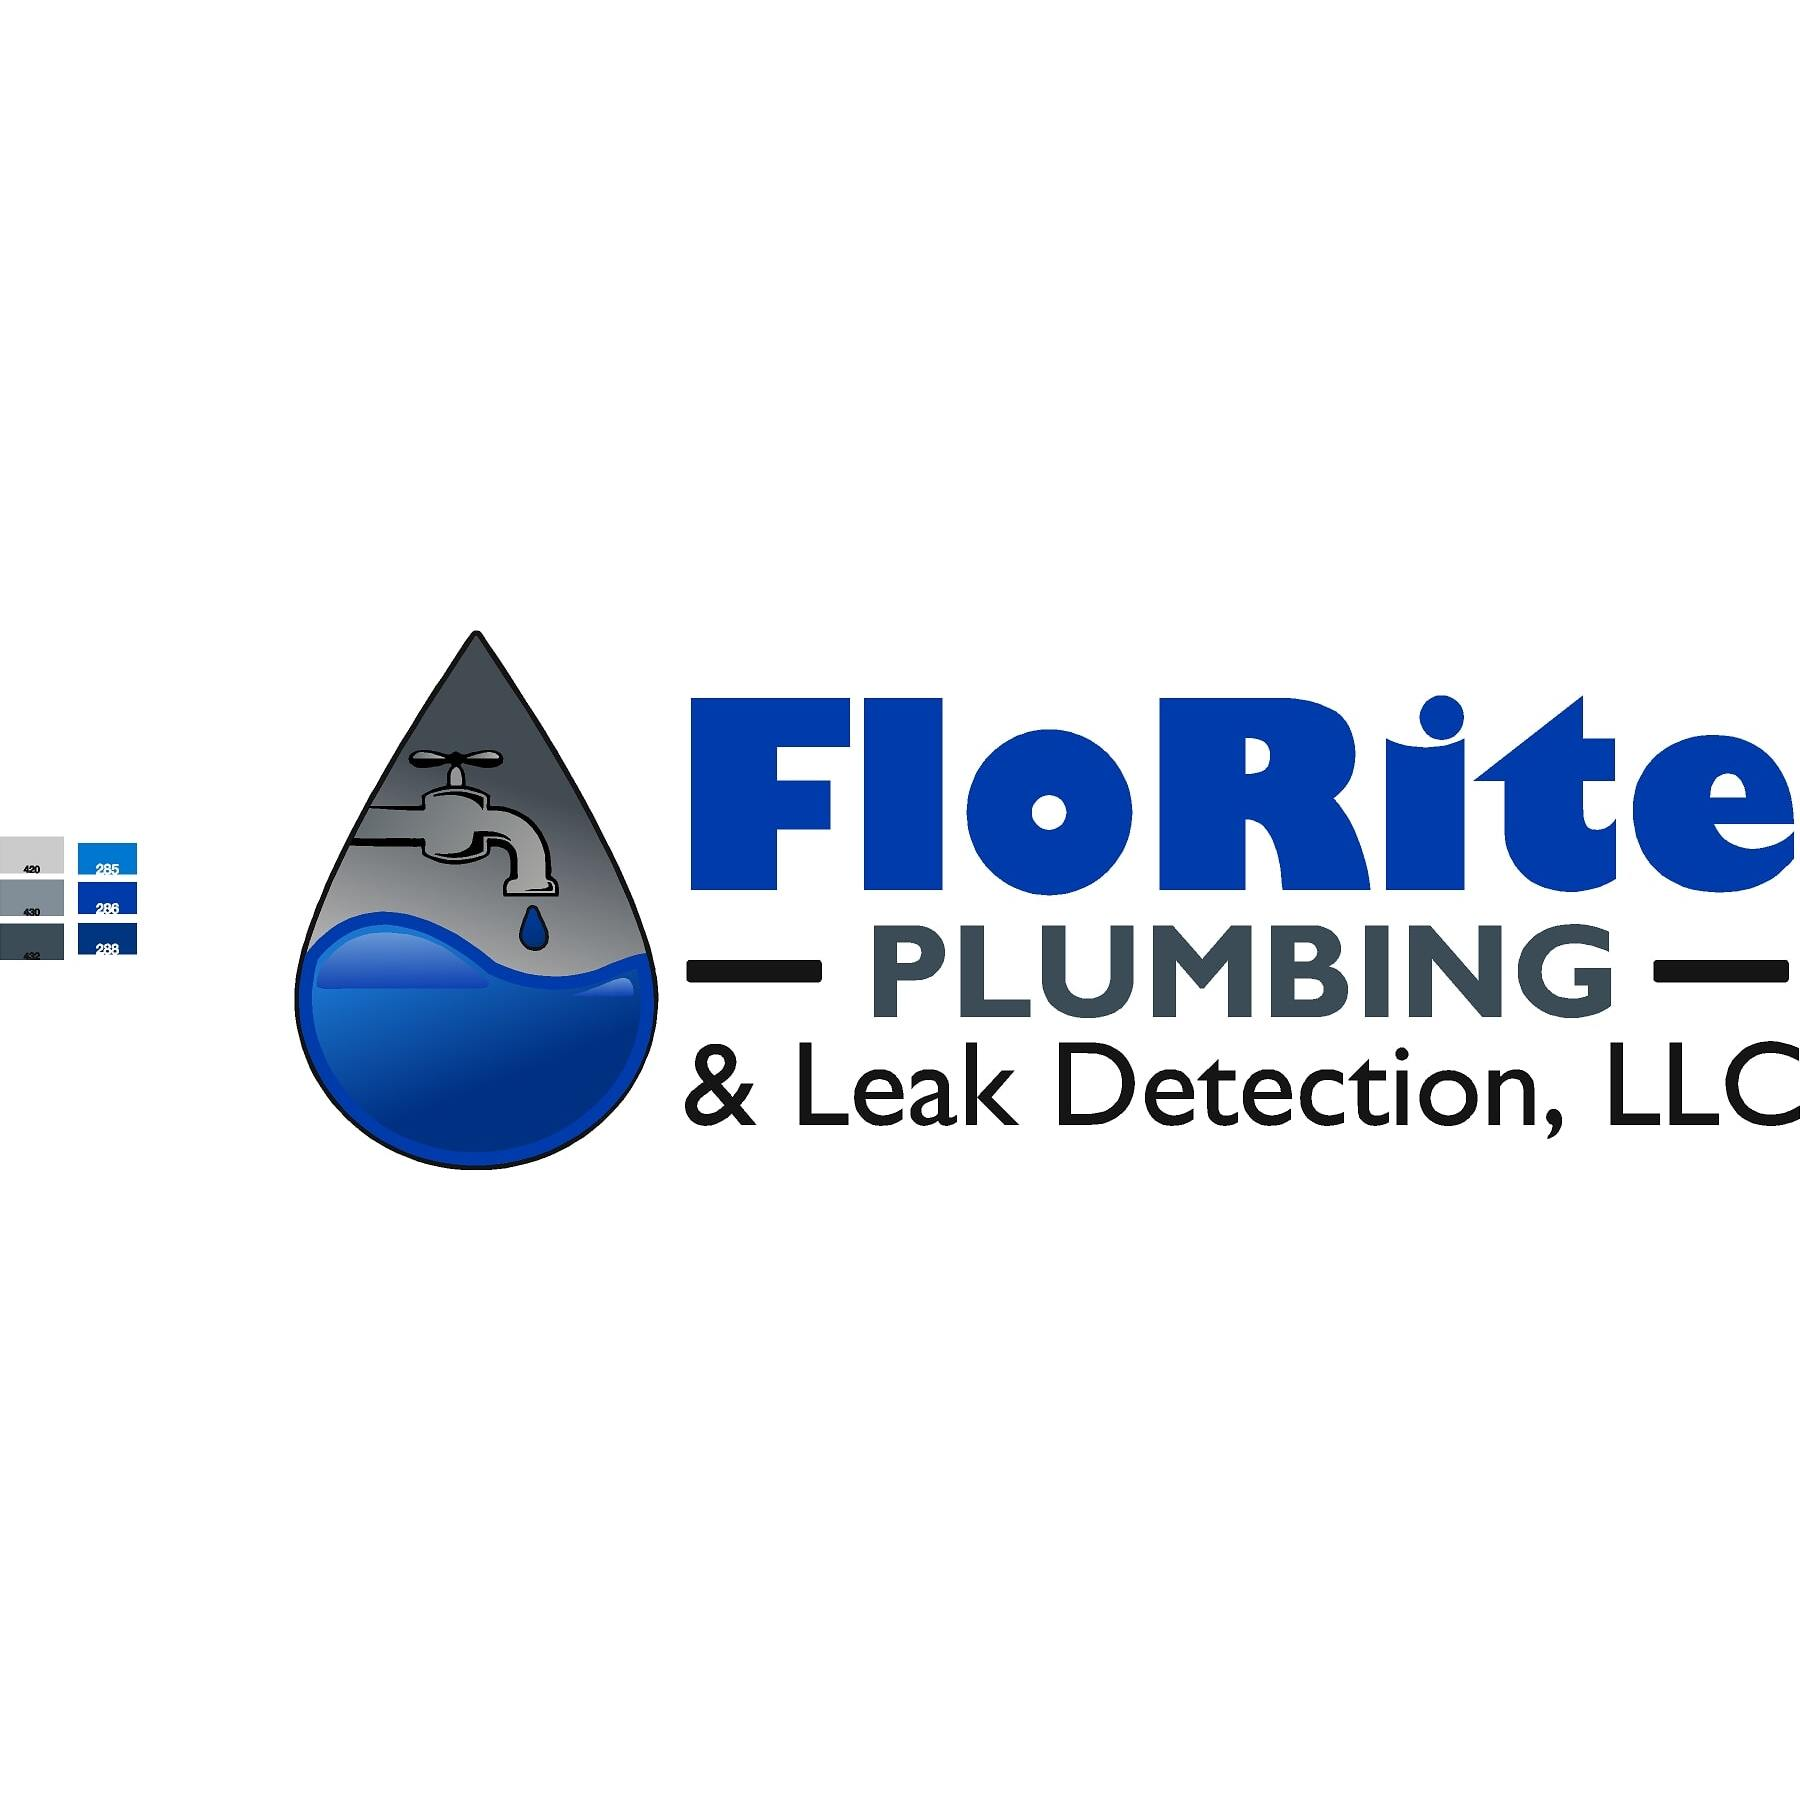 FloRite Plumbing & Leak Detection